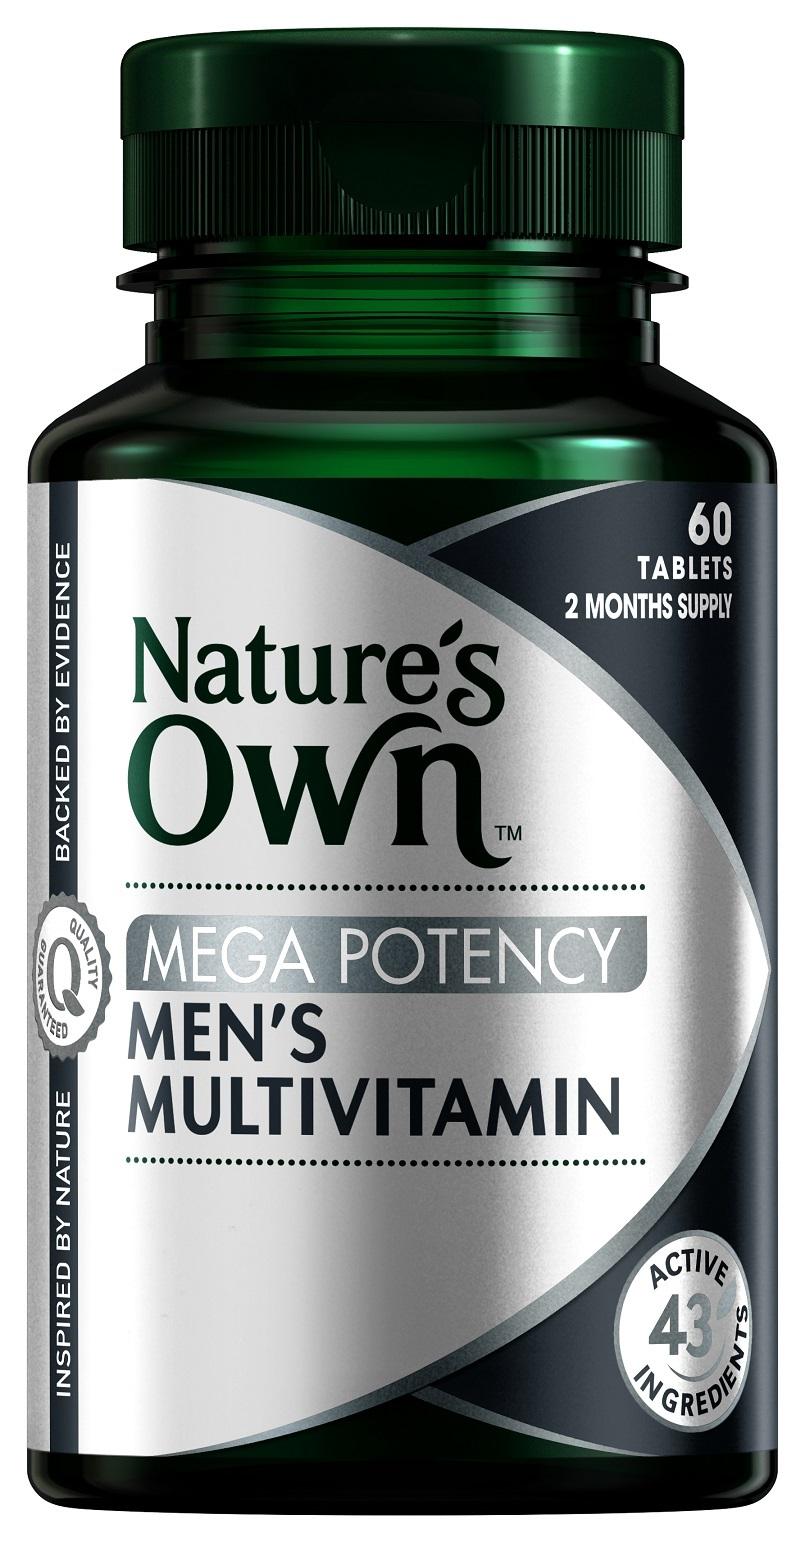 Qoo10 Natures Own Men Diet Wellness Way Multivitamin With Spirulina 200 Tablets Actual Size Prev Next Mens Mega Potency 60